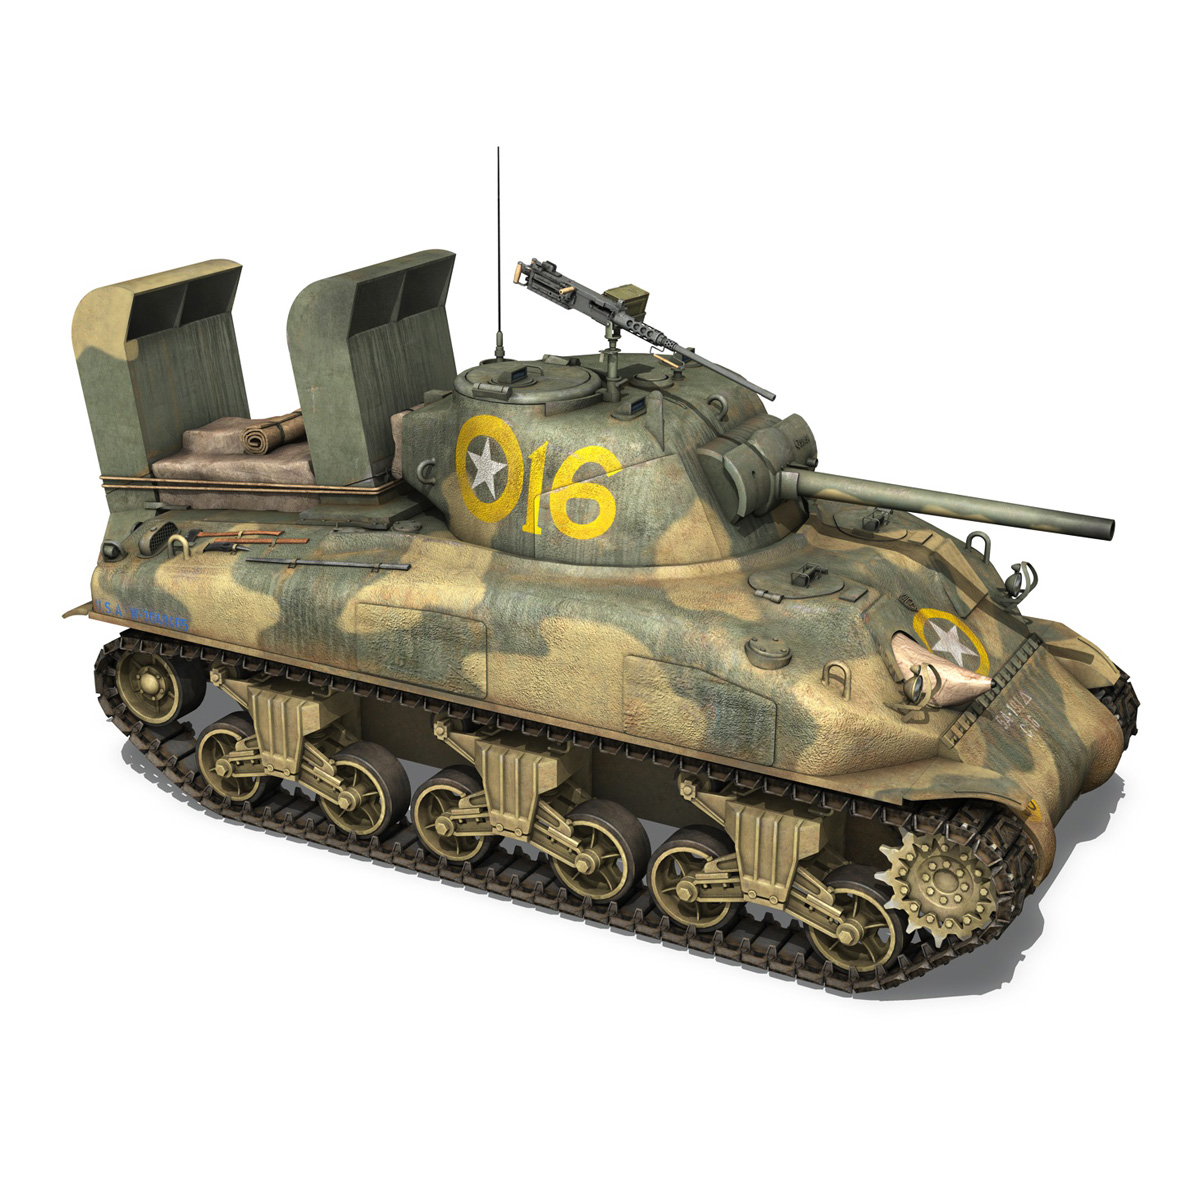 M4A1 Sherman - 16 3d model 3ds fbx c4d lwo lws lw obj 273056